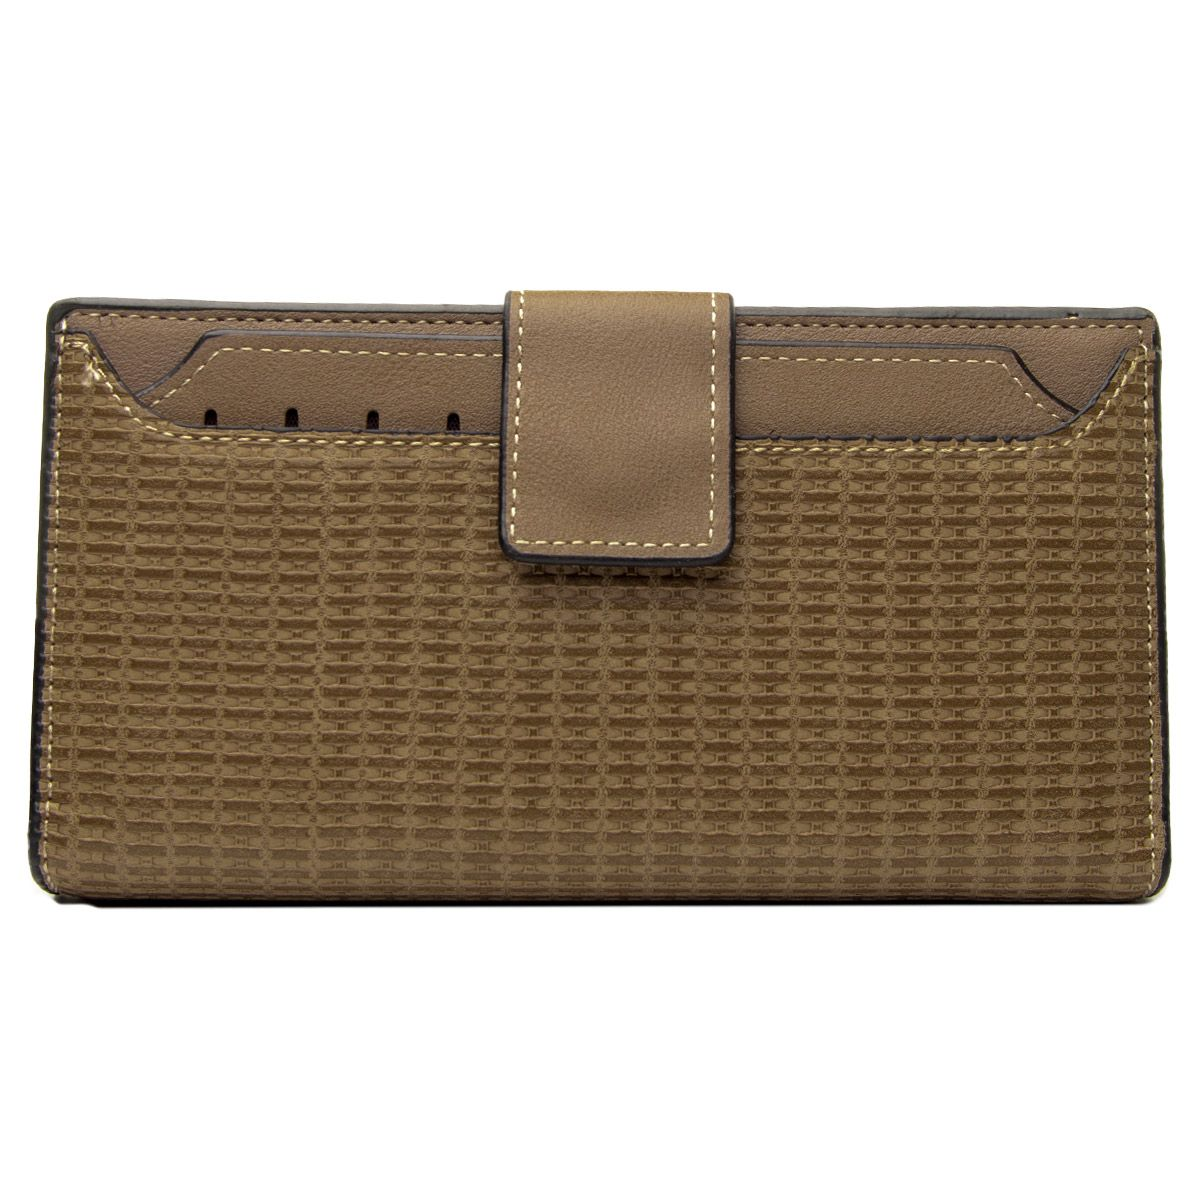 Montevita Leather Purse in Beige